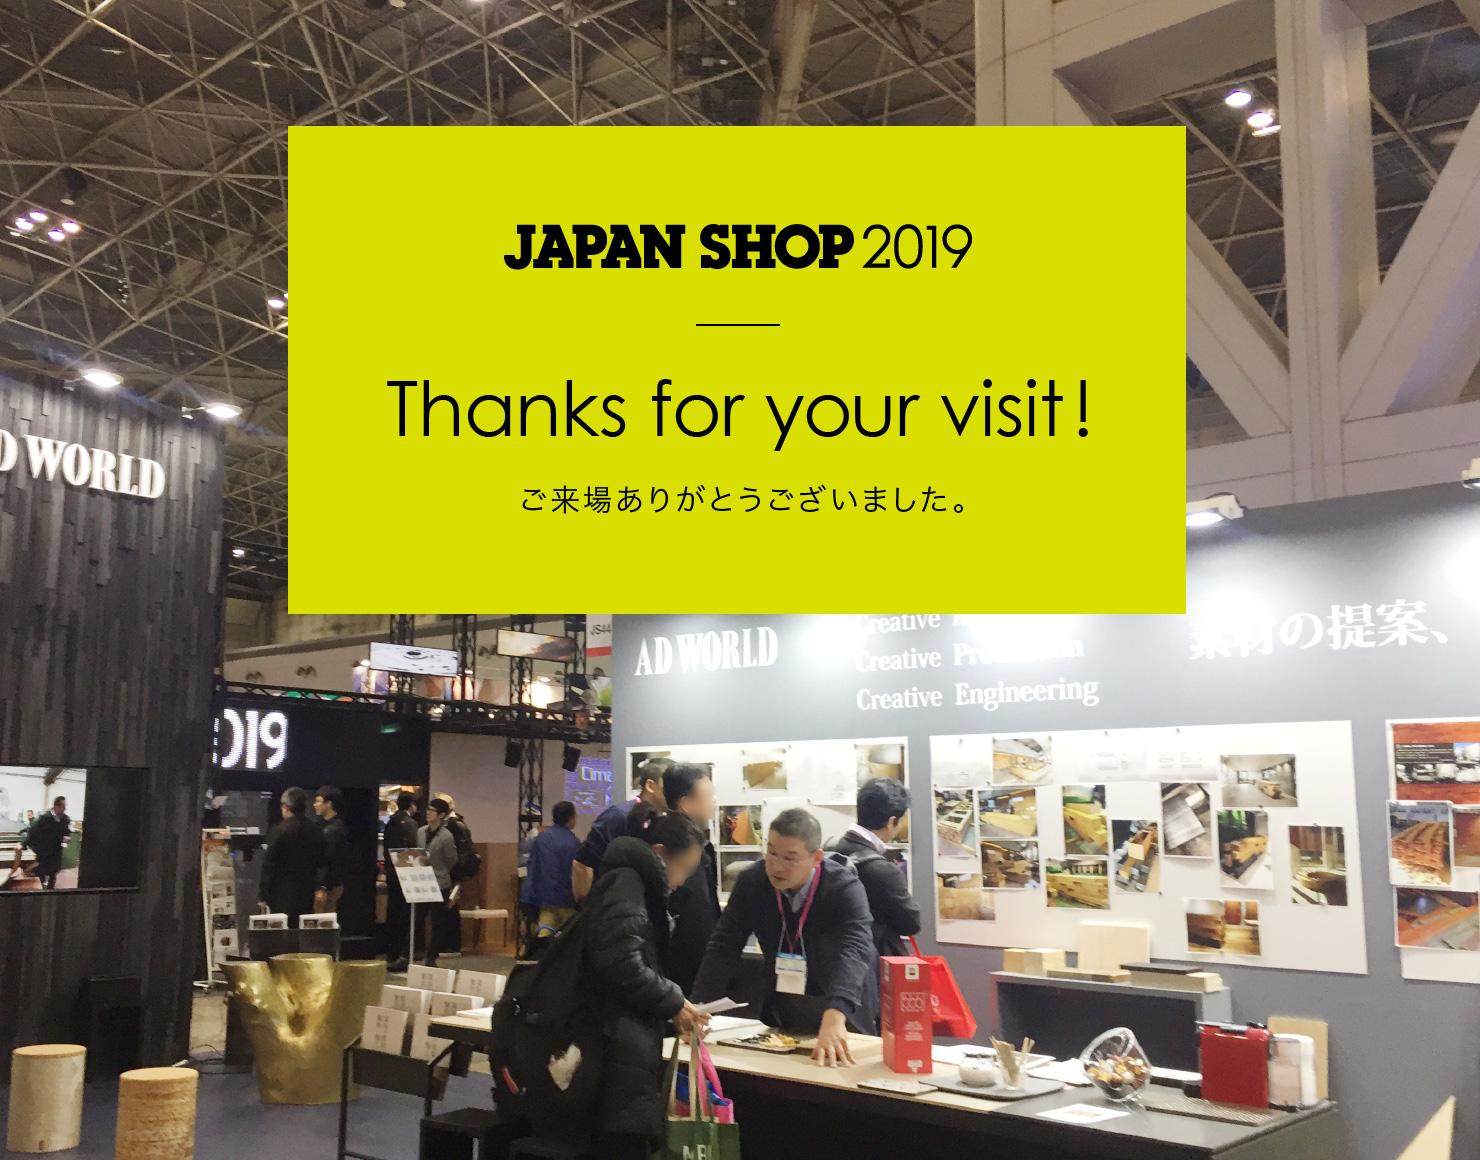 JAPAN SHOP 2019 ご来場ありがとうございました。